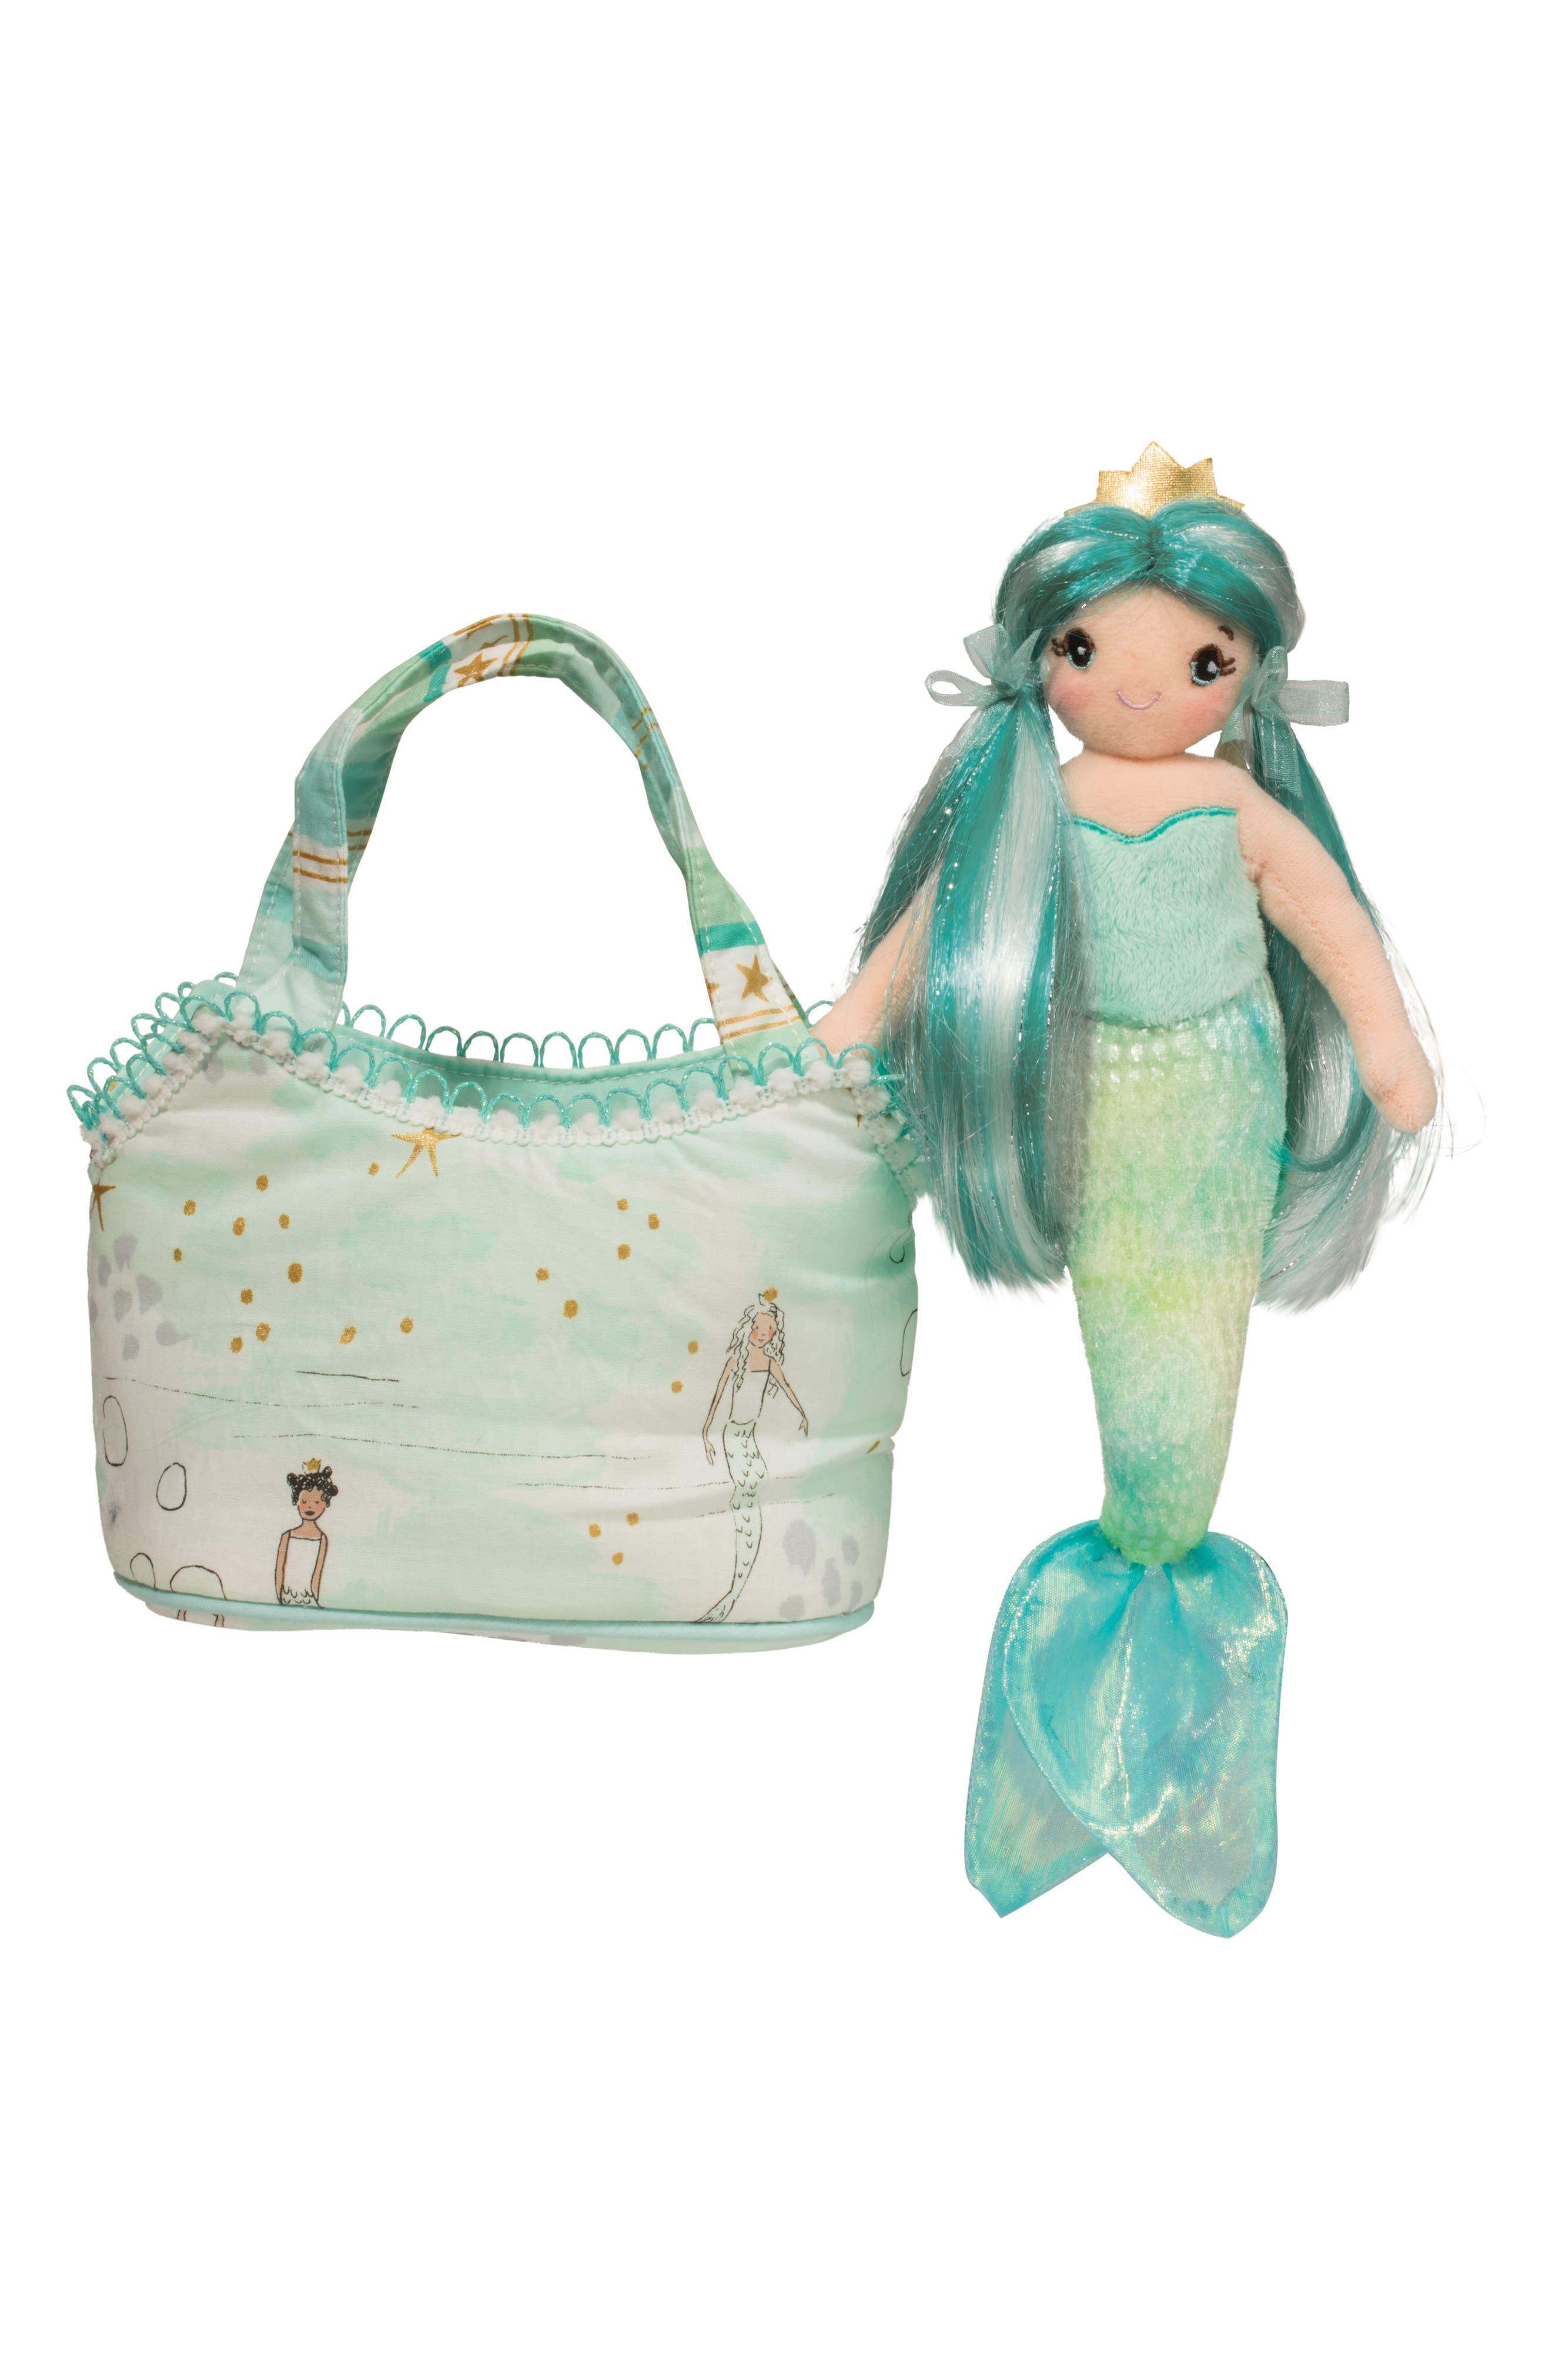 Main Image - Douglas Princess Mermaid Doll & Handbag